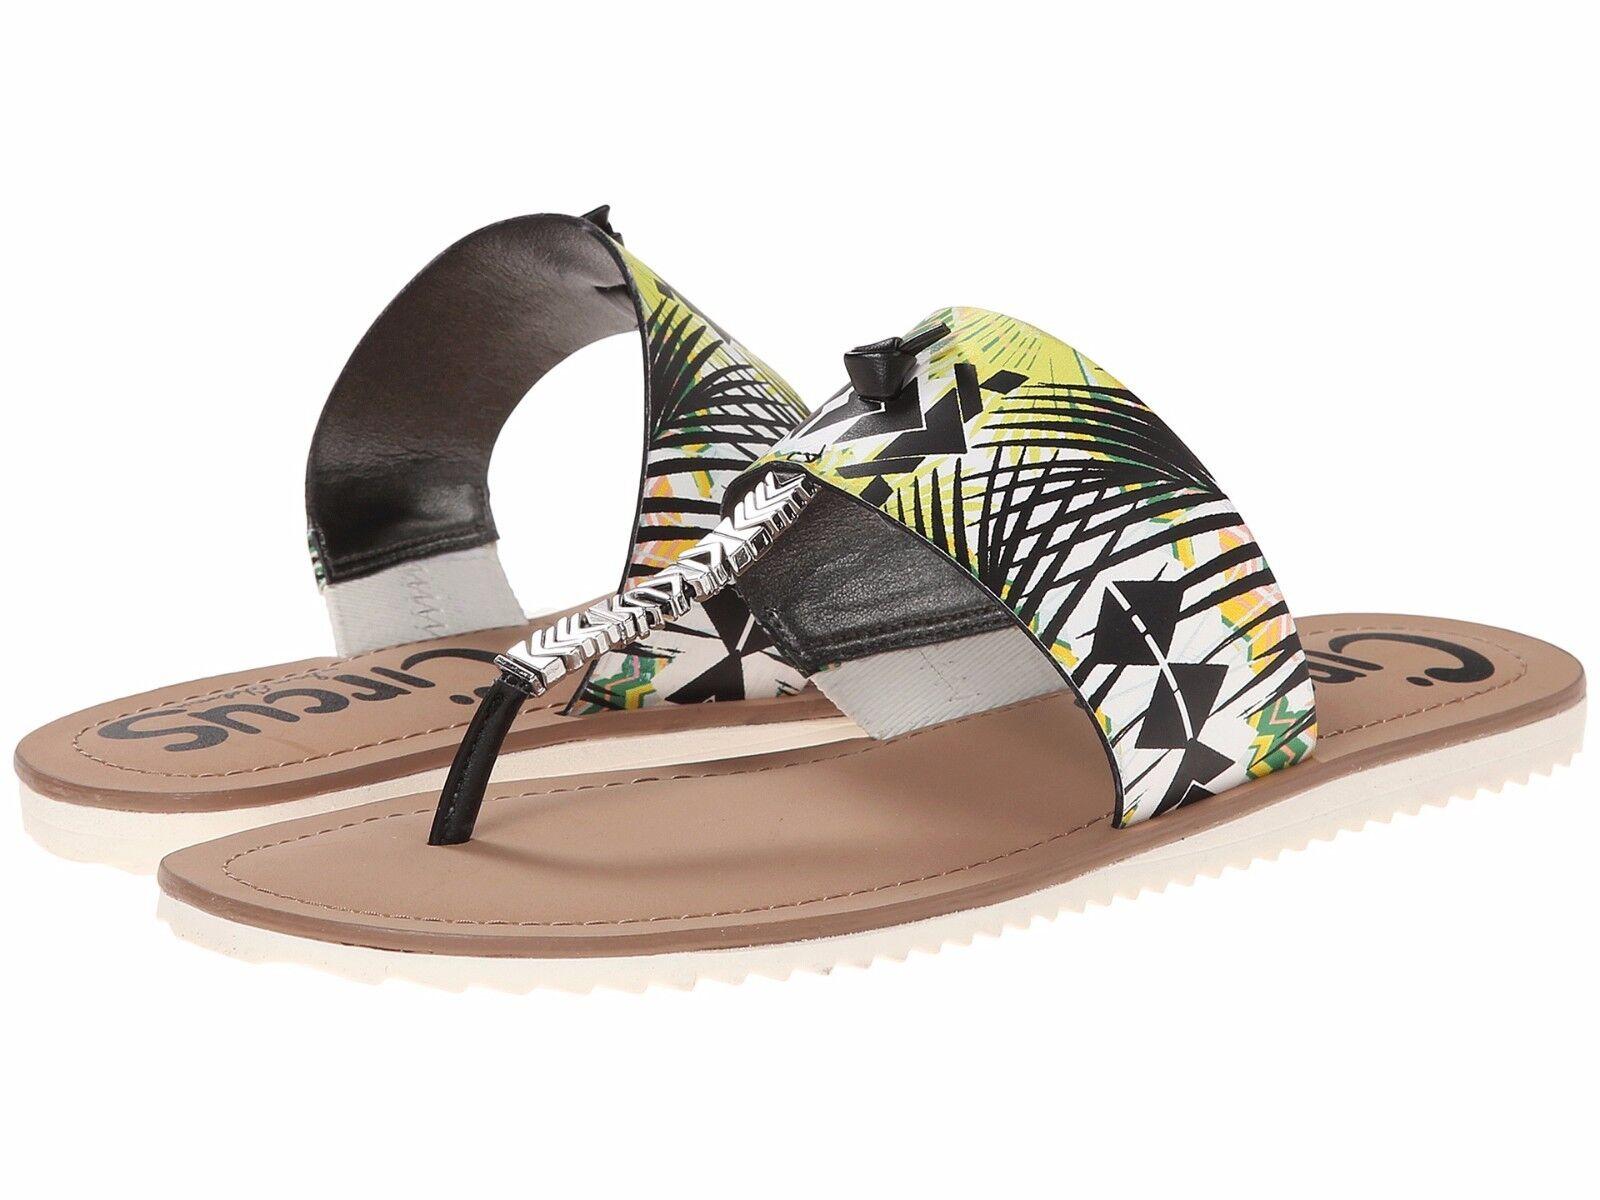 New CIRCUS BY SAM EDELMAN   Saxon  lime Sandals size 5.5